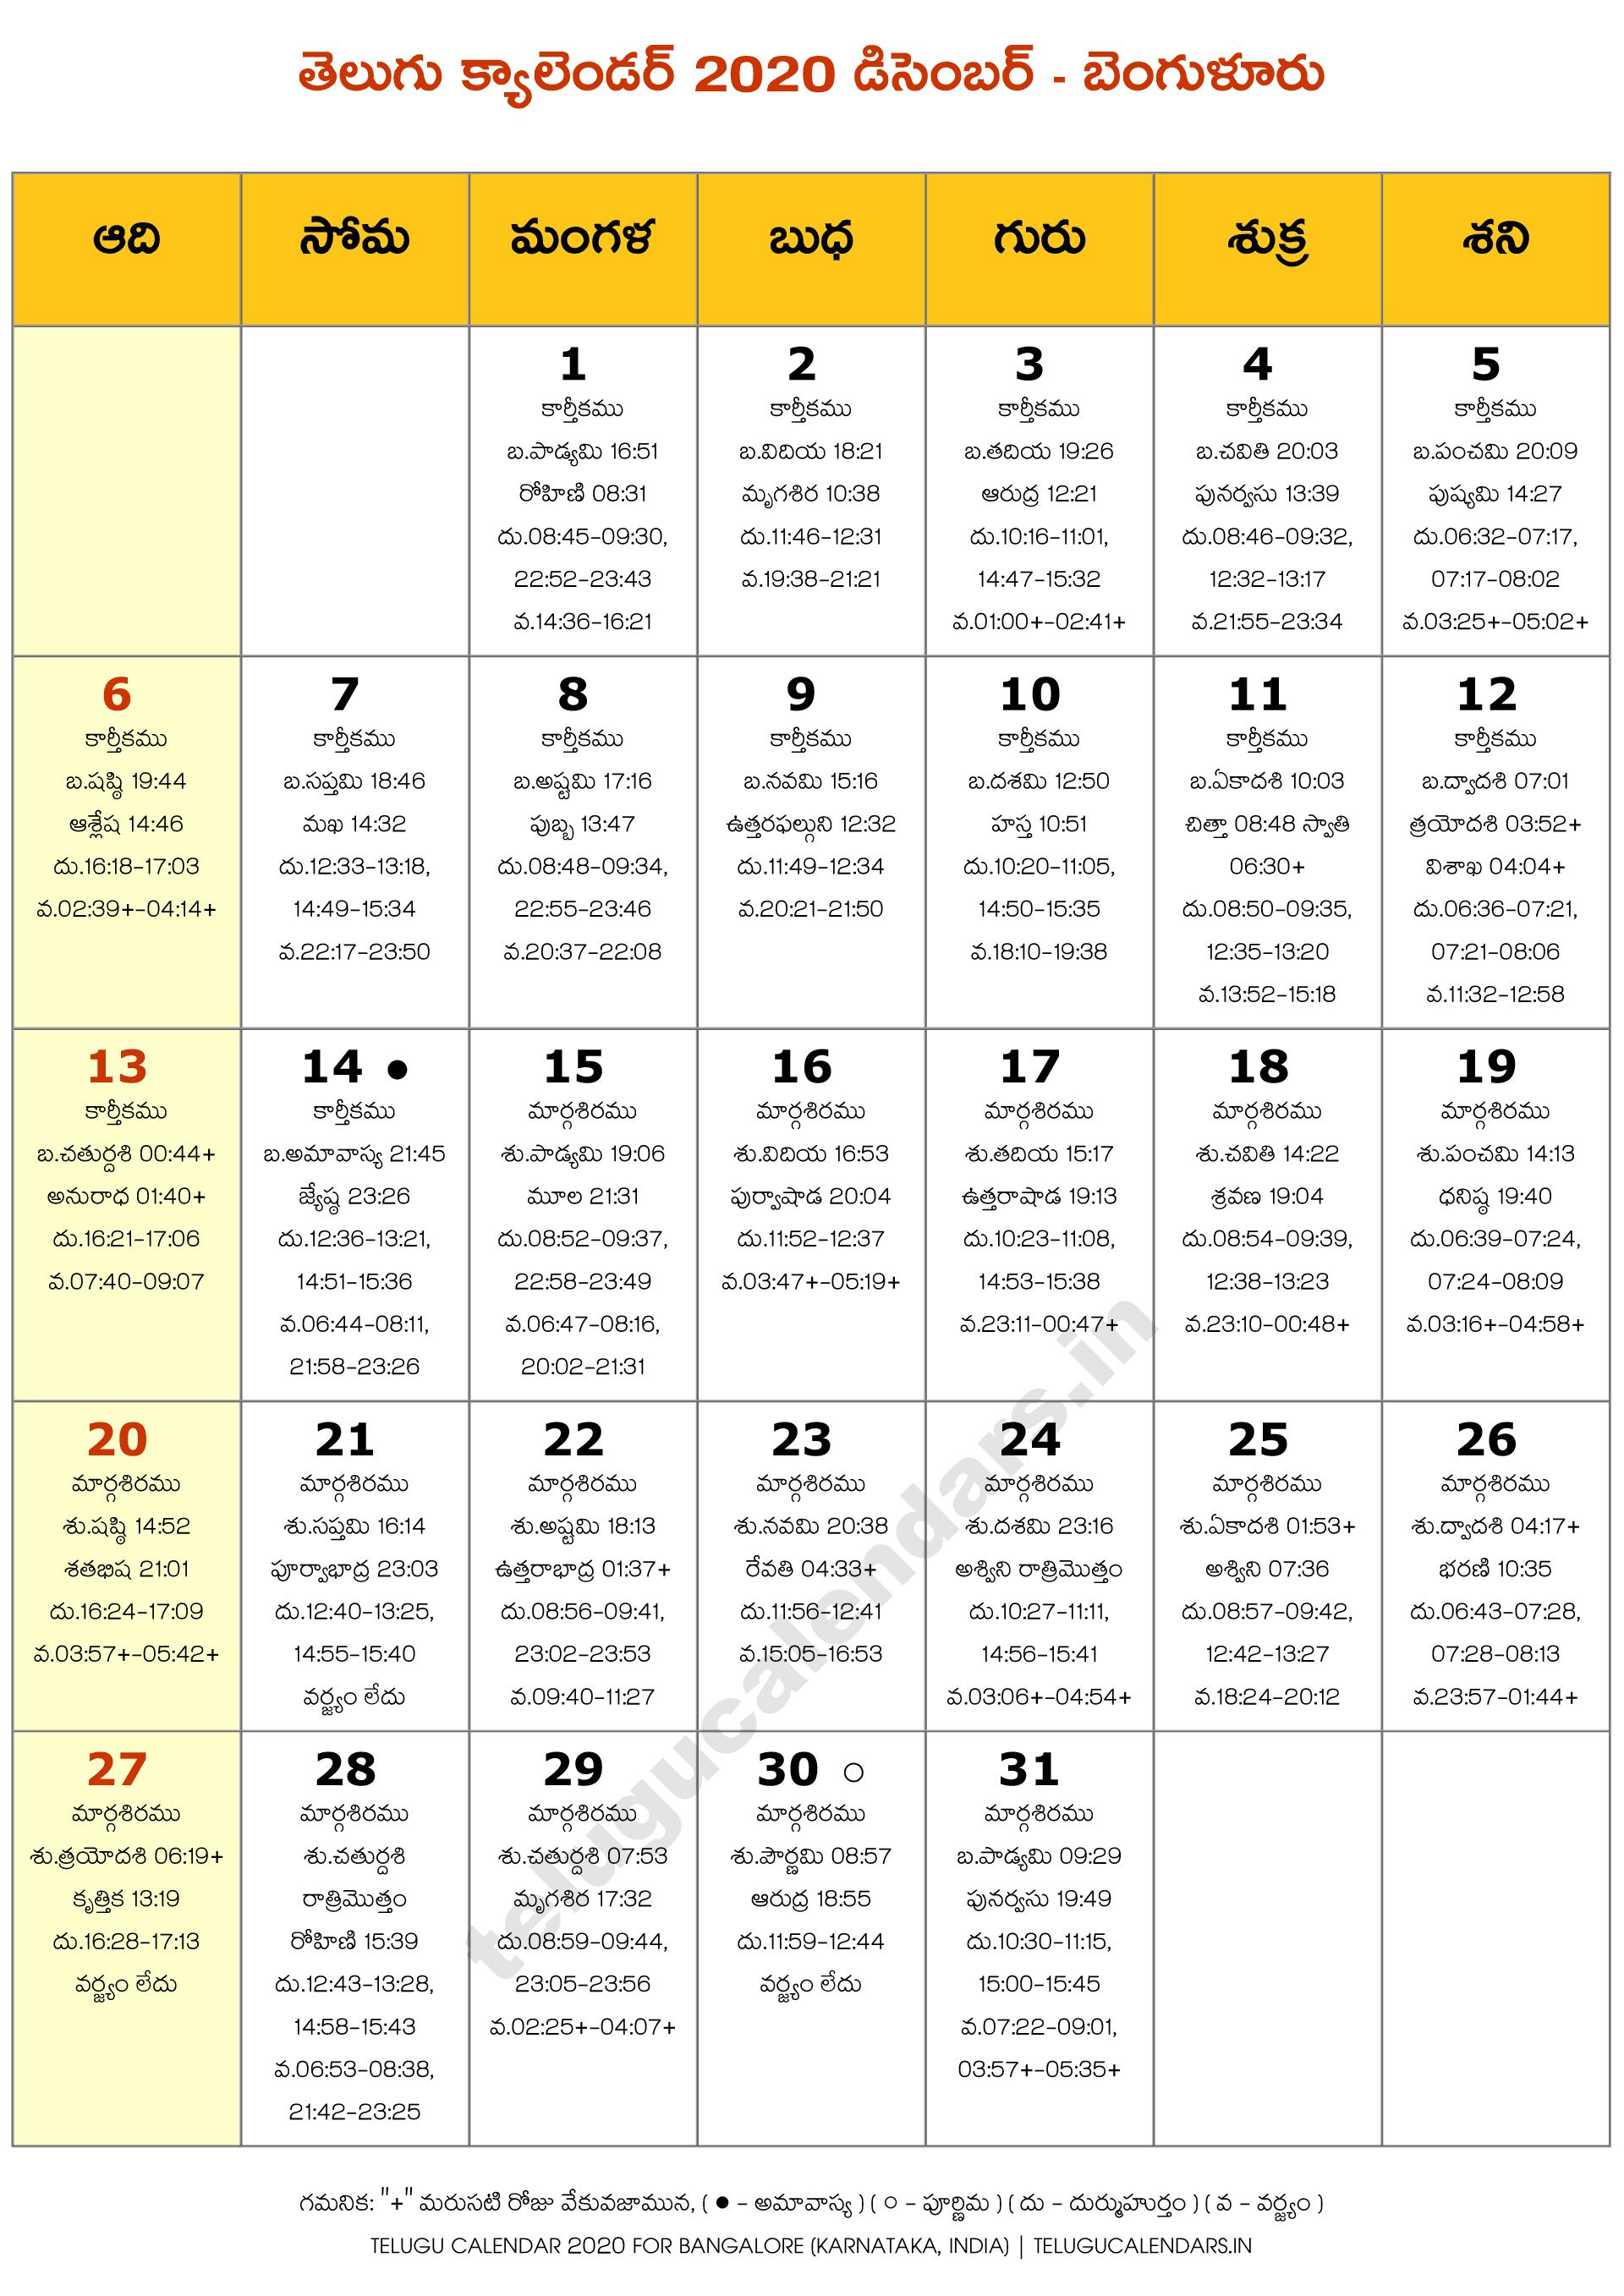 Bengaluru 2020 December Telugu Calendar | Telugu Calendars